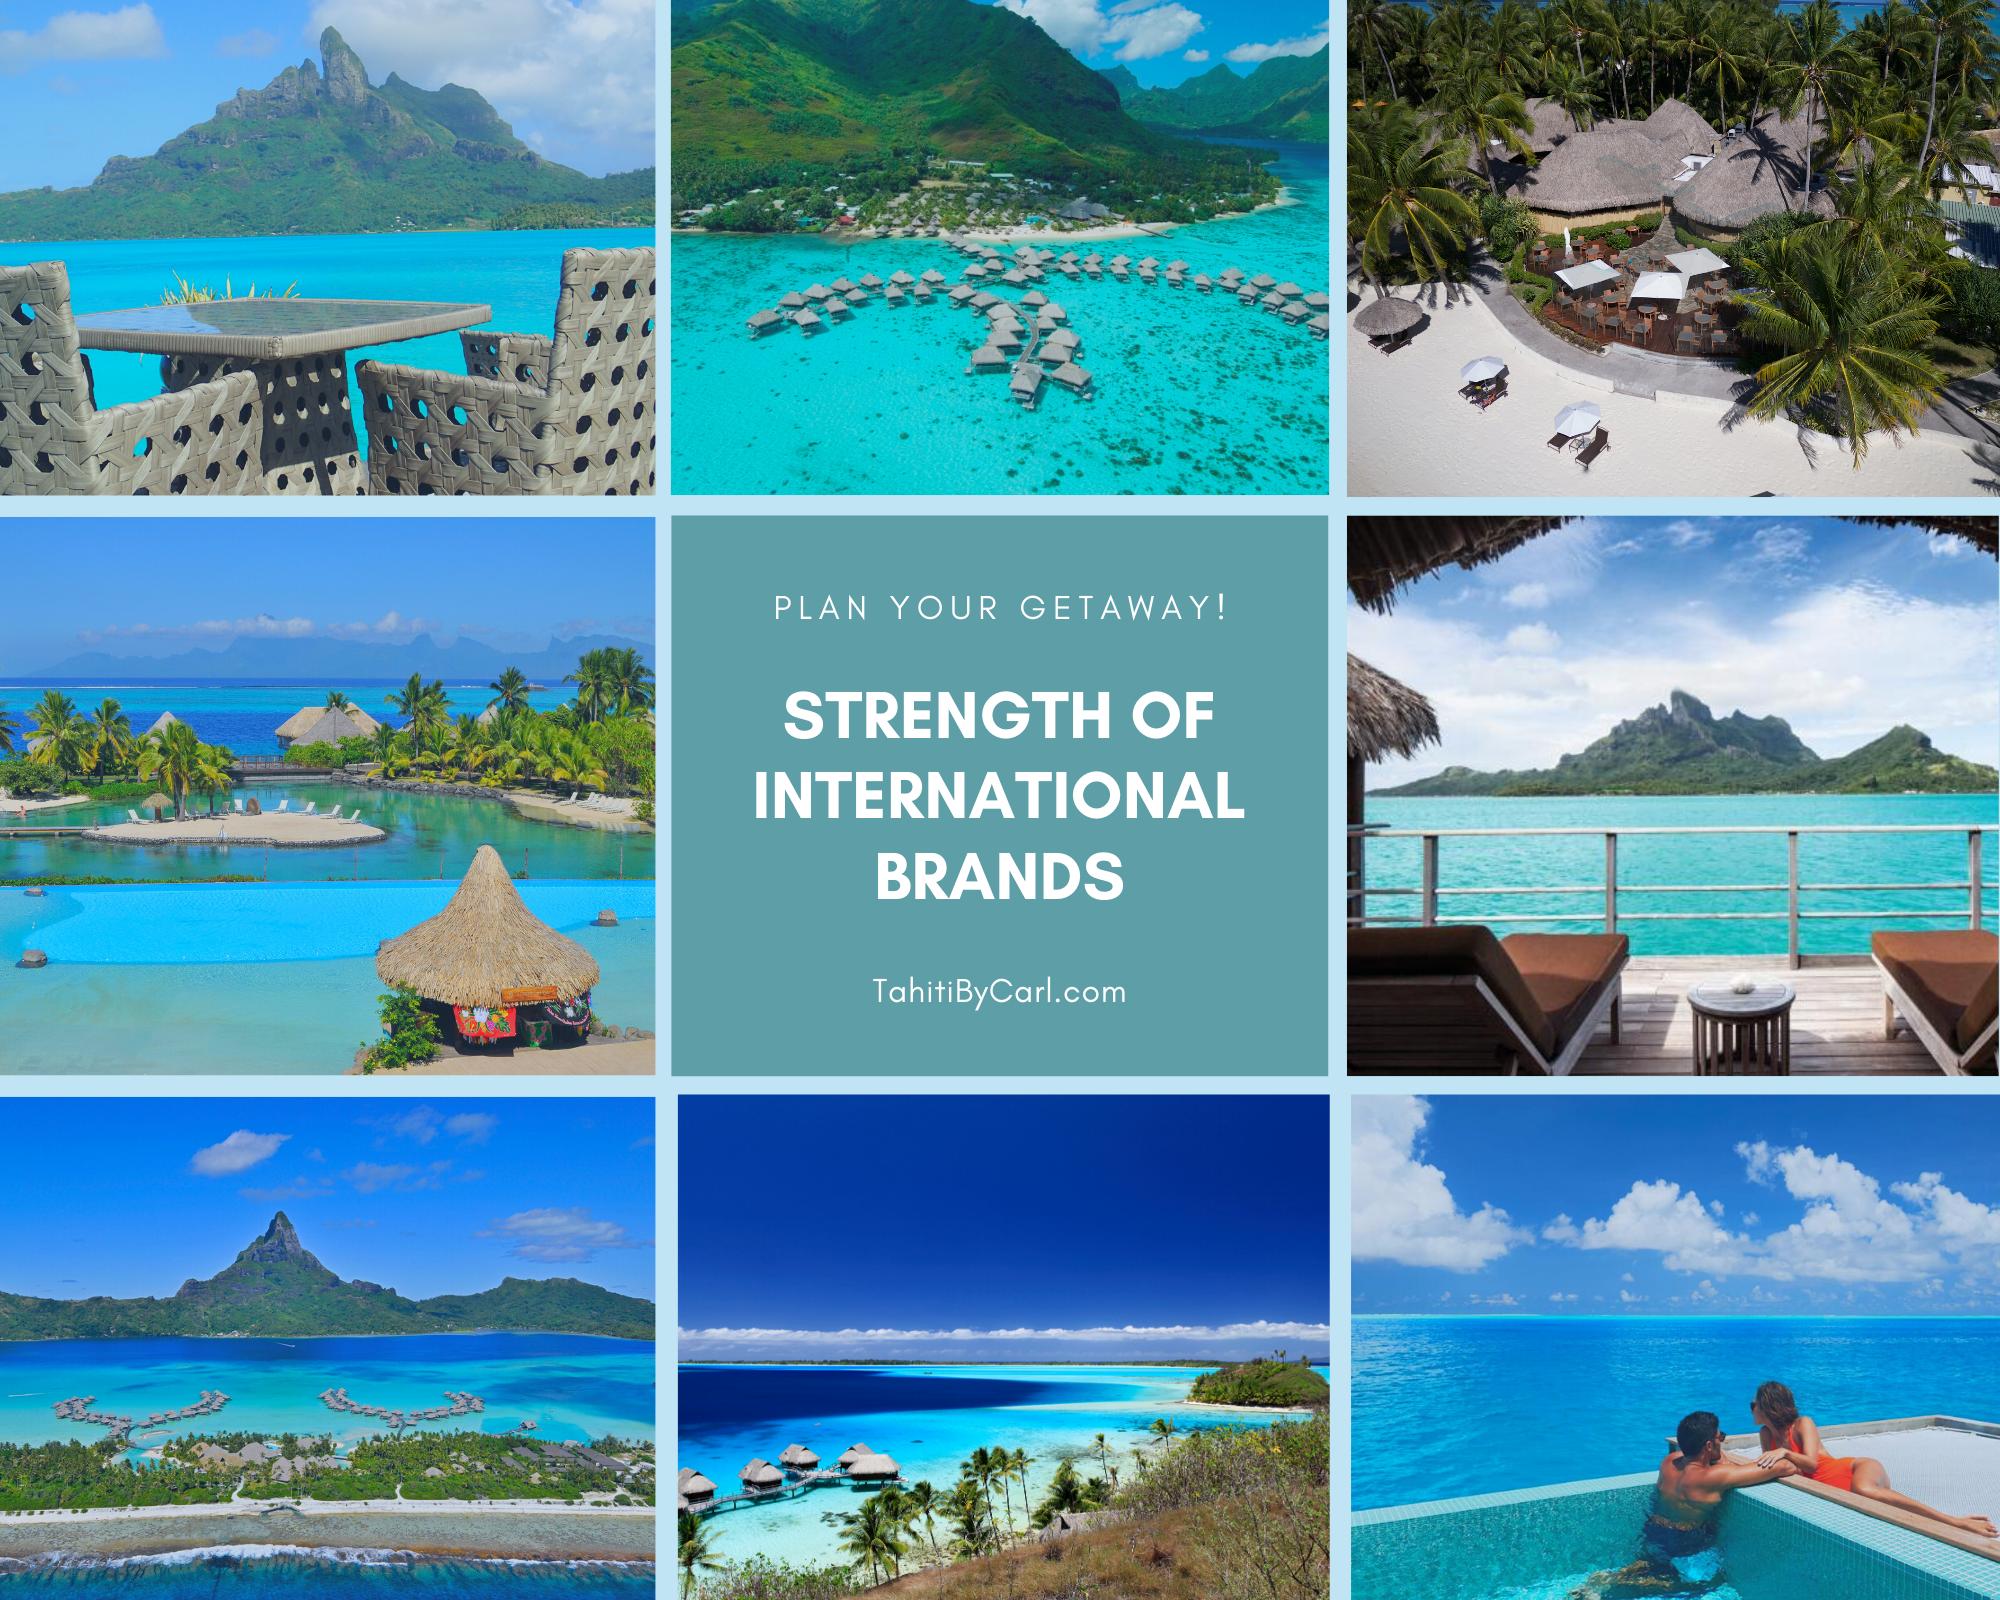 International Hotel Brands of Tahiti